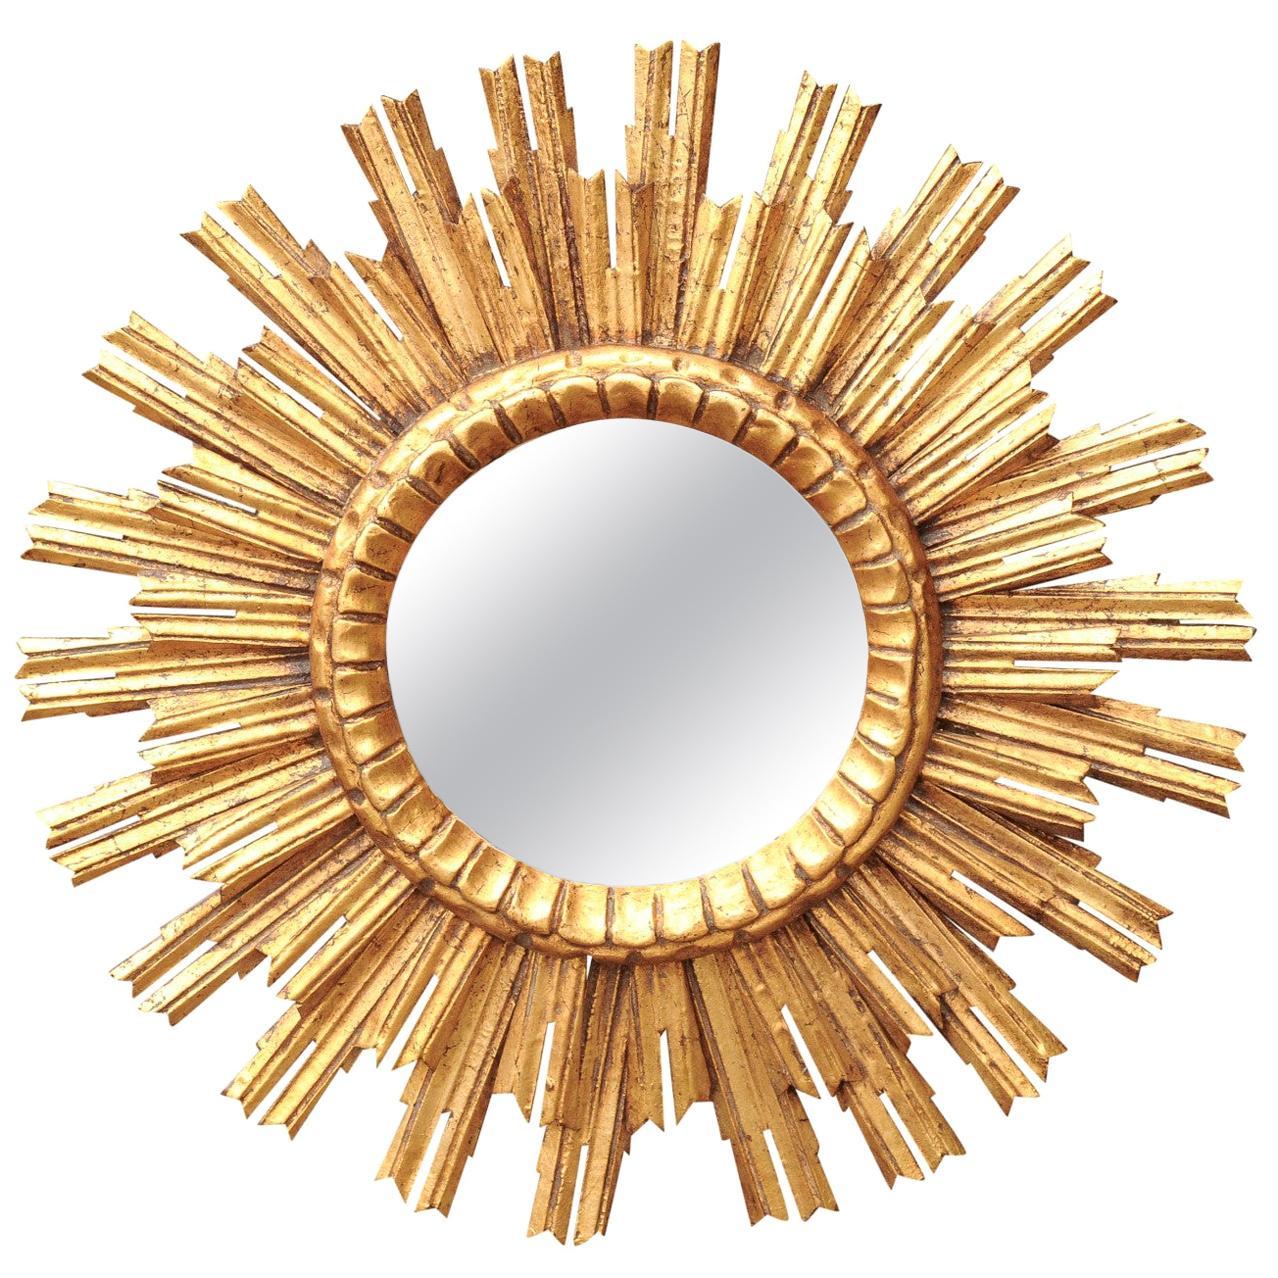 Vintage French Giltwood Sunburst Mirror with Layered Sunrays, circa 1960